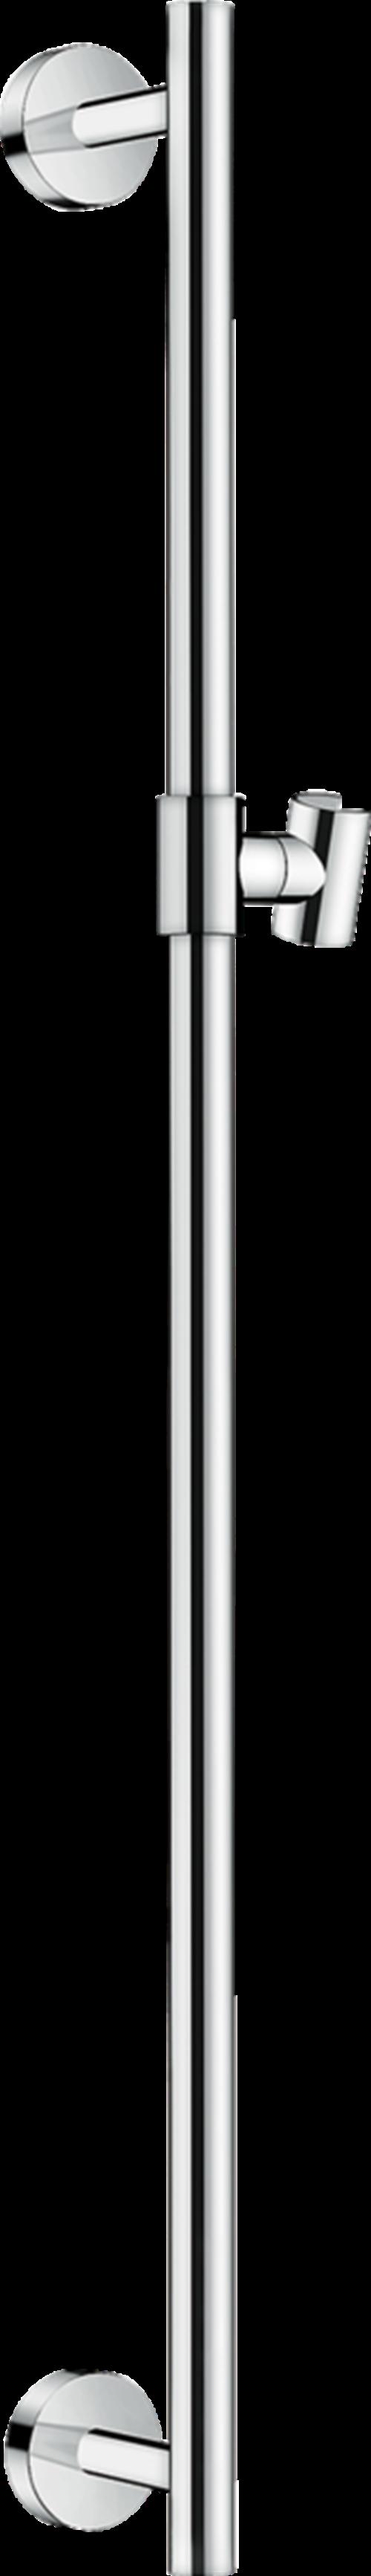 Hansgrohe Unica 26402000